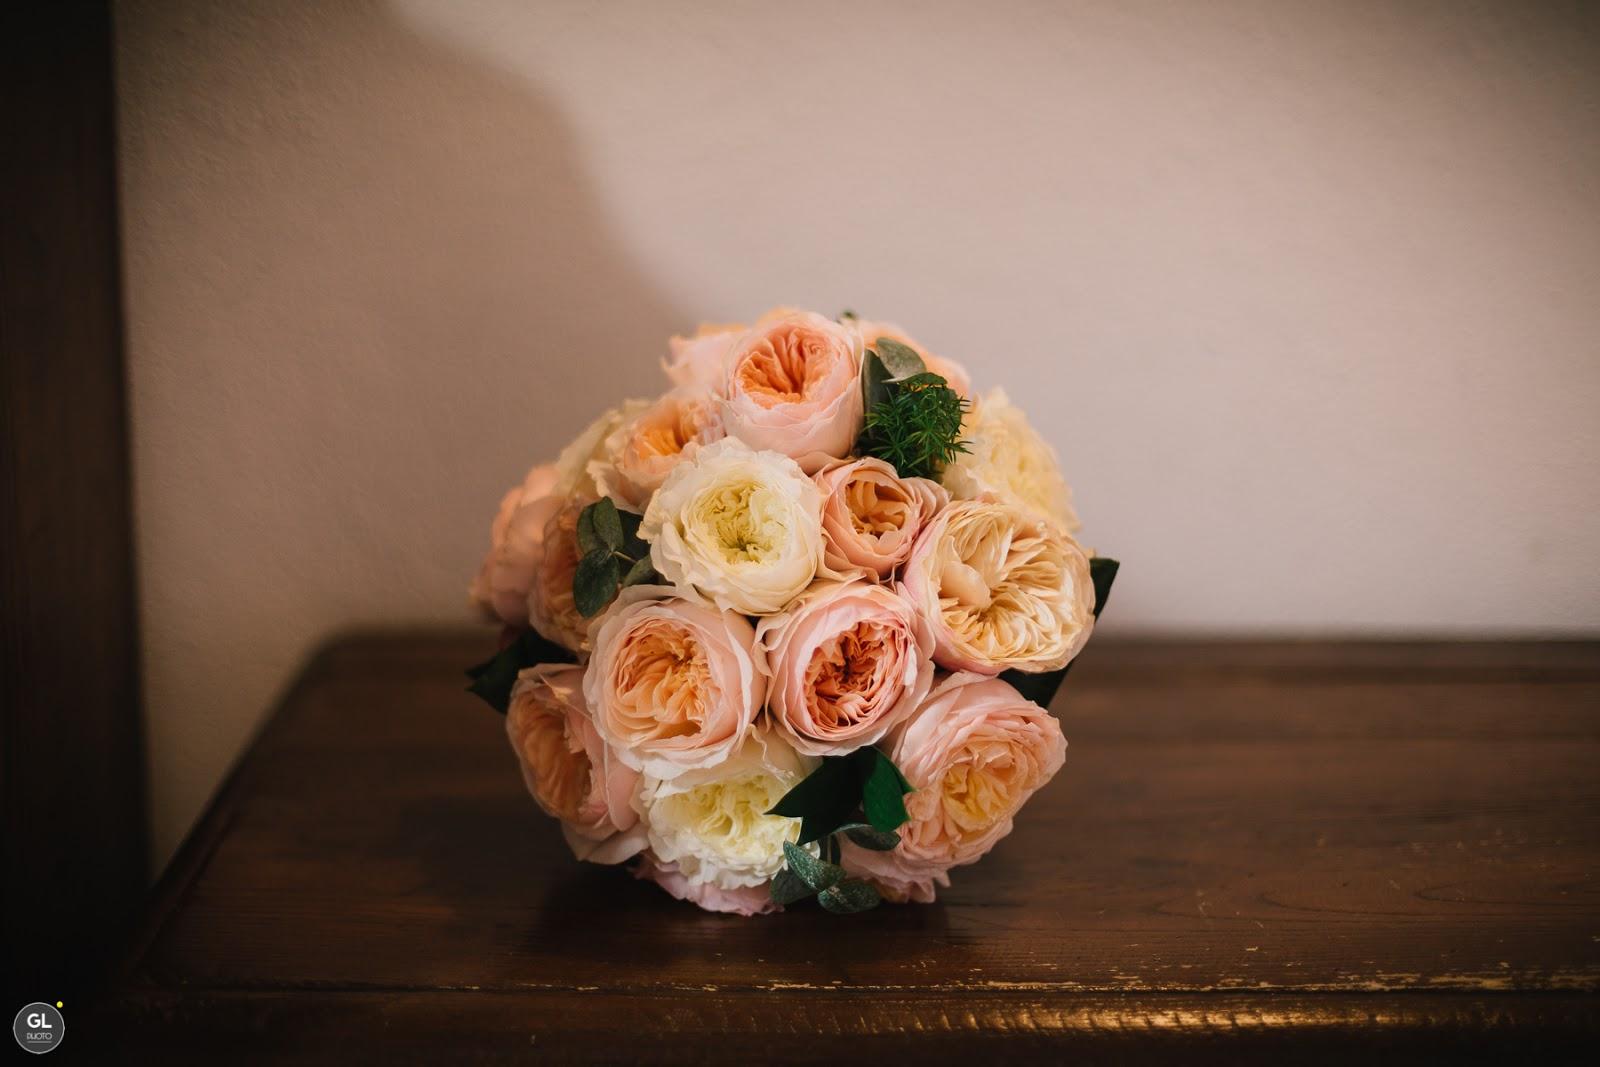 Bouquet sposa rose garden bianco e rosa